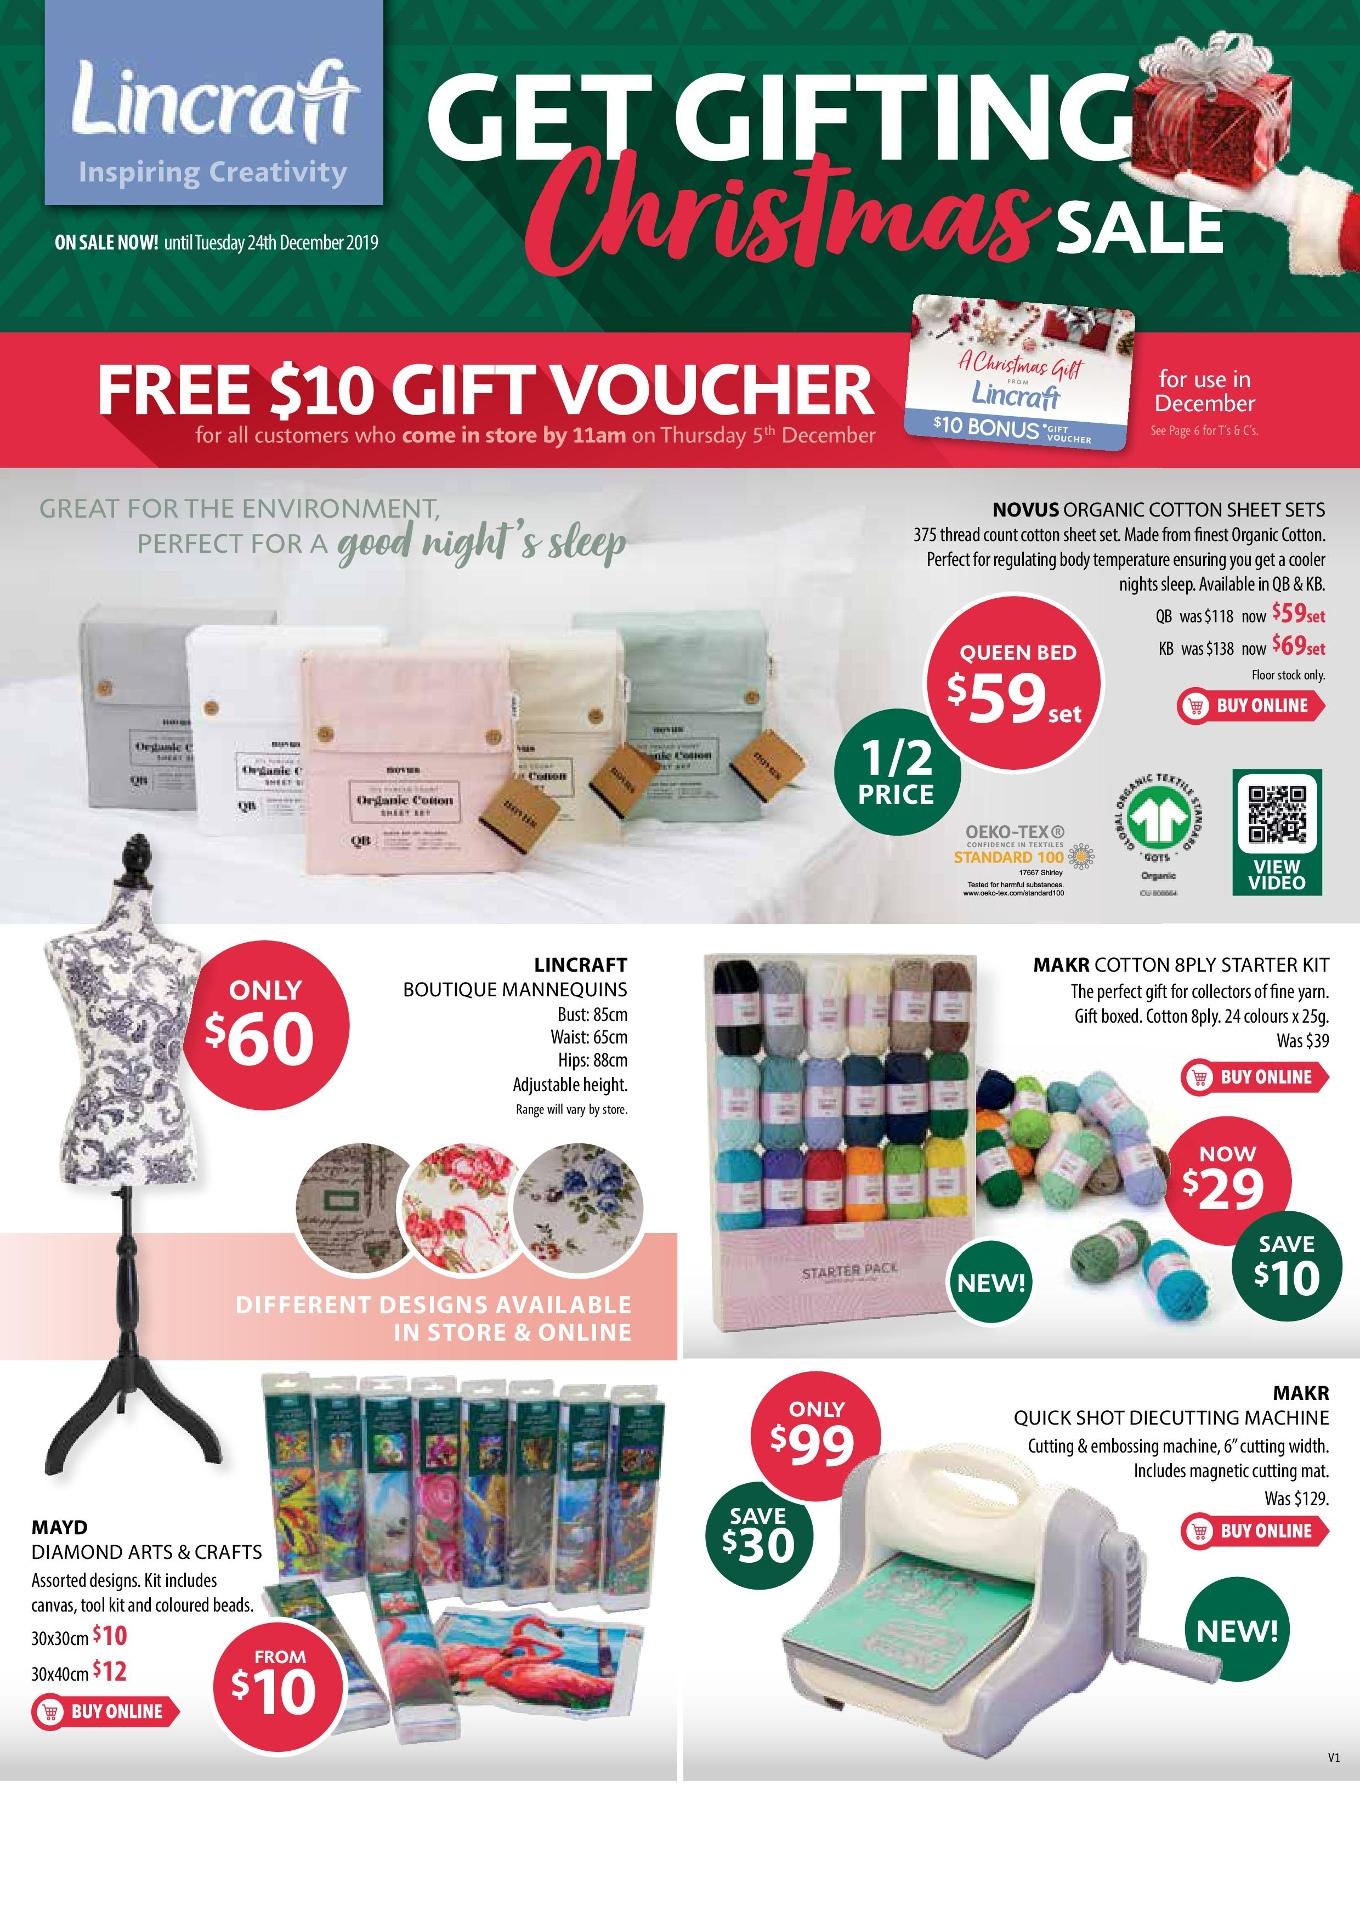 Lincraft Catalogue 1 December - 24 December 2019. Get Gifting Christmas Sale!